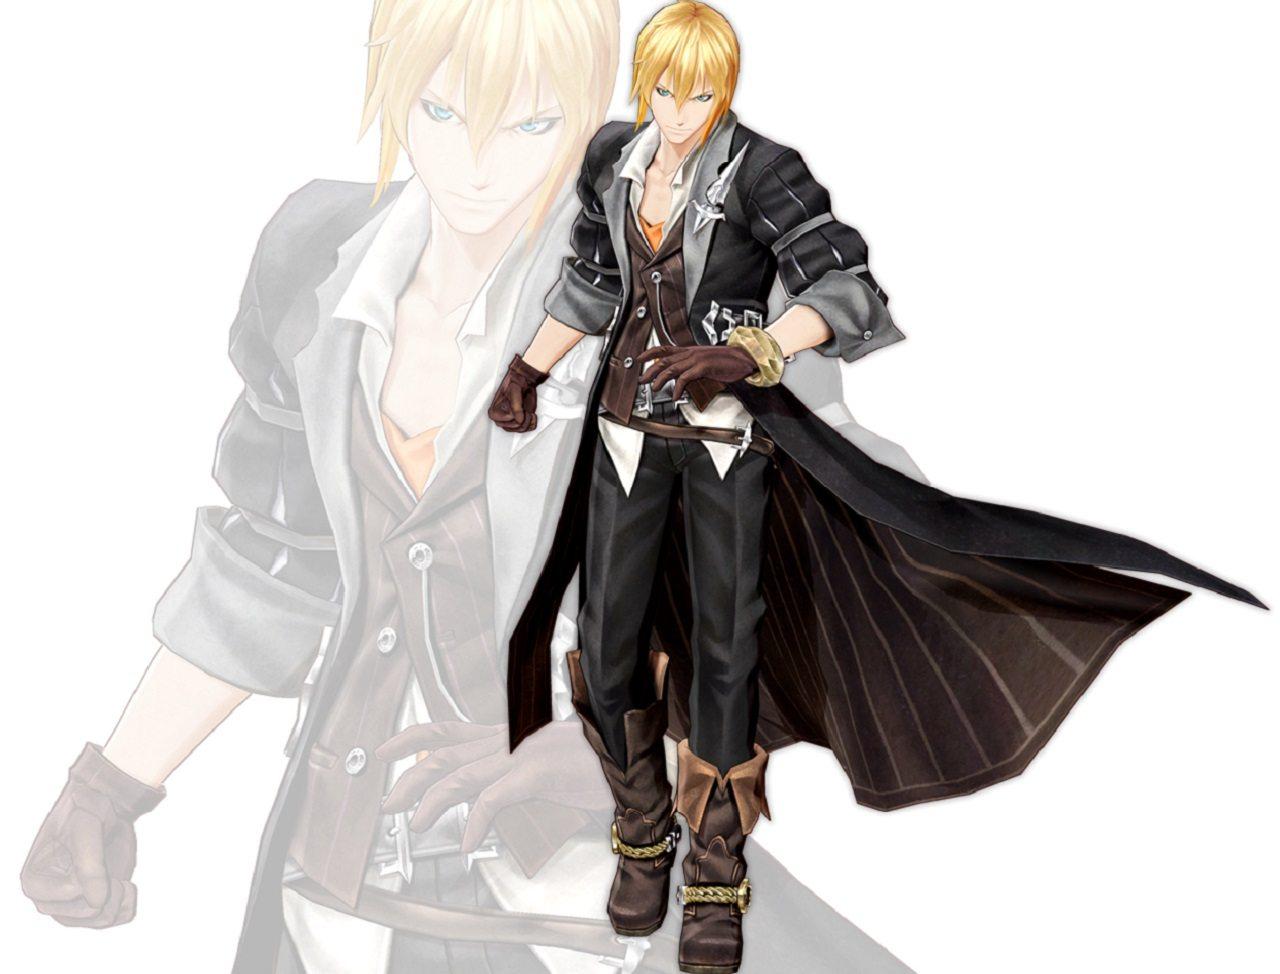 eizen-ultimo-trailer-tales-of-berseria-gamesoul